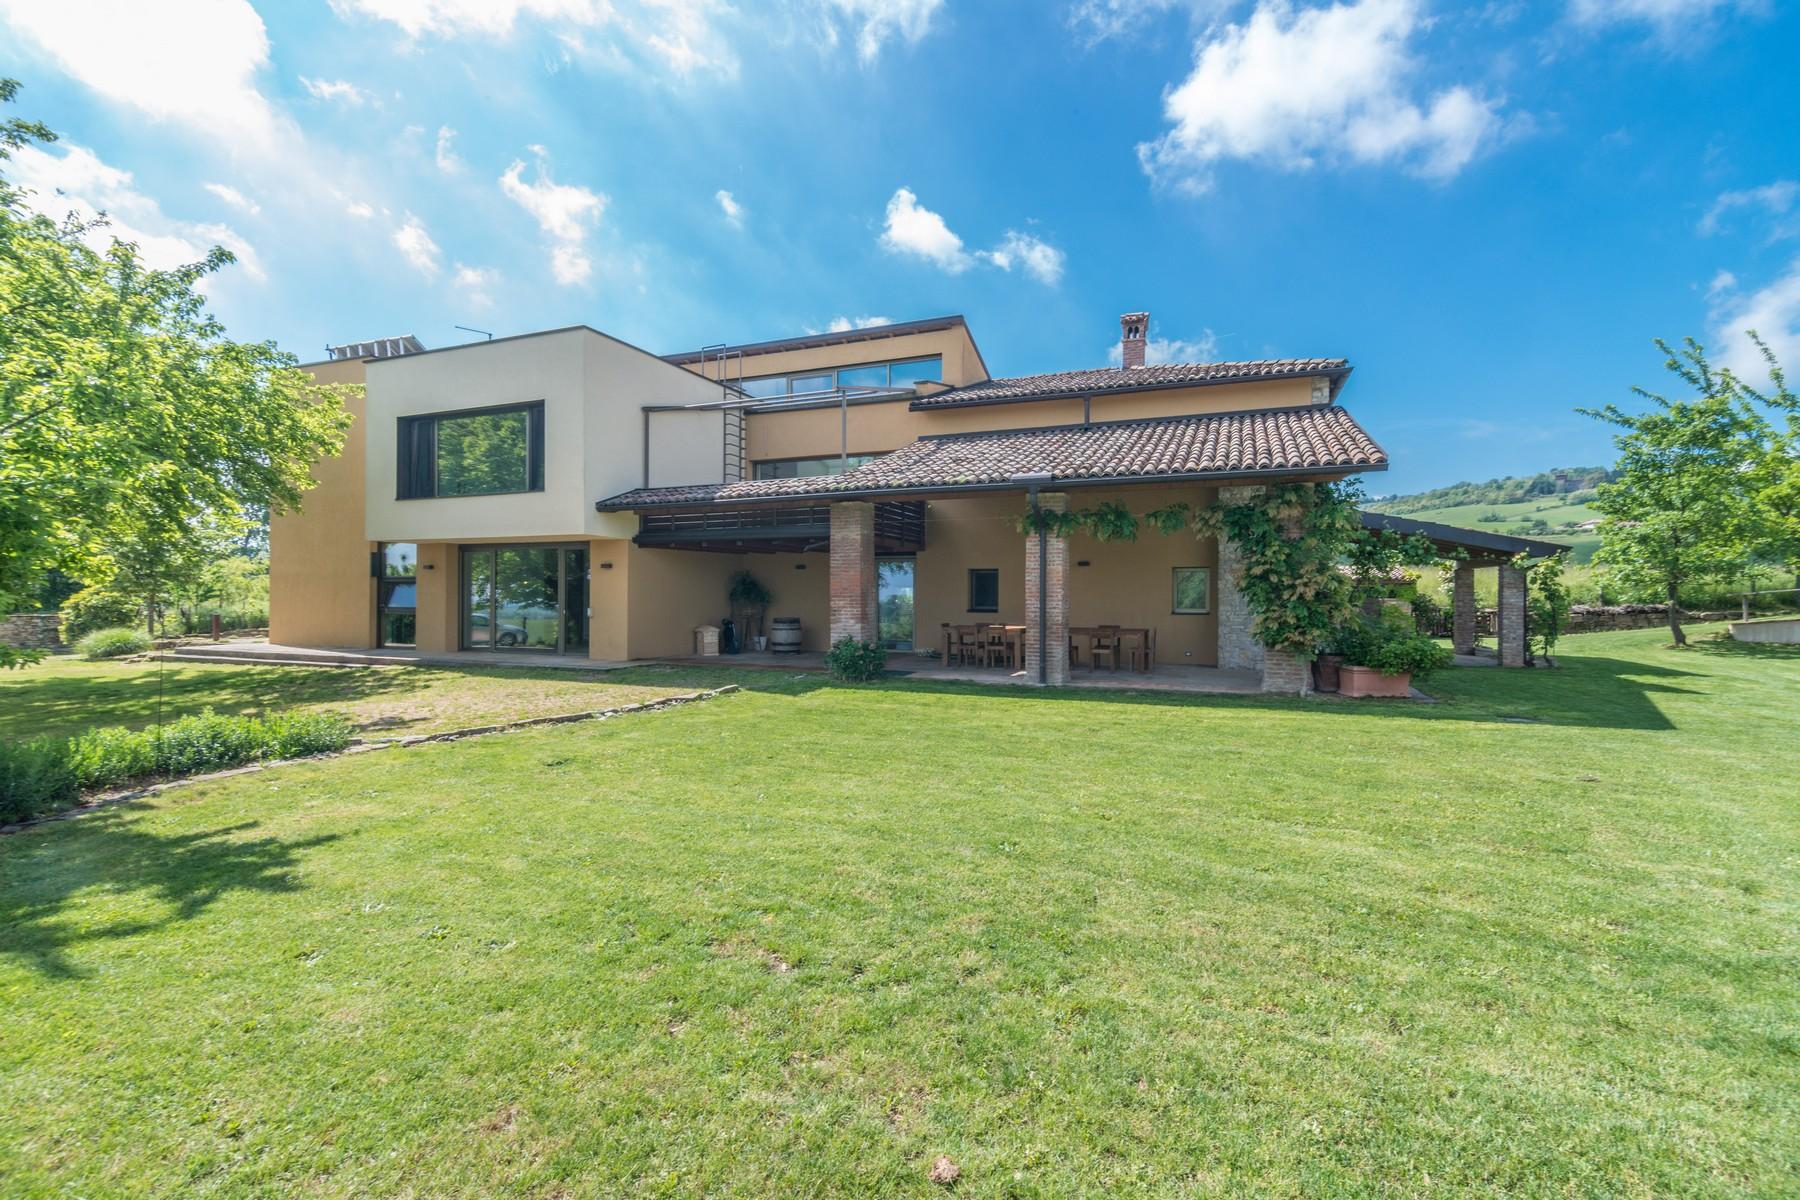 Villa in Vendita a Piacenza: 5 locali, 800 mq - Foto 3